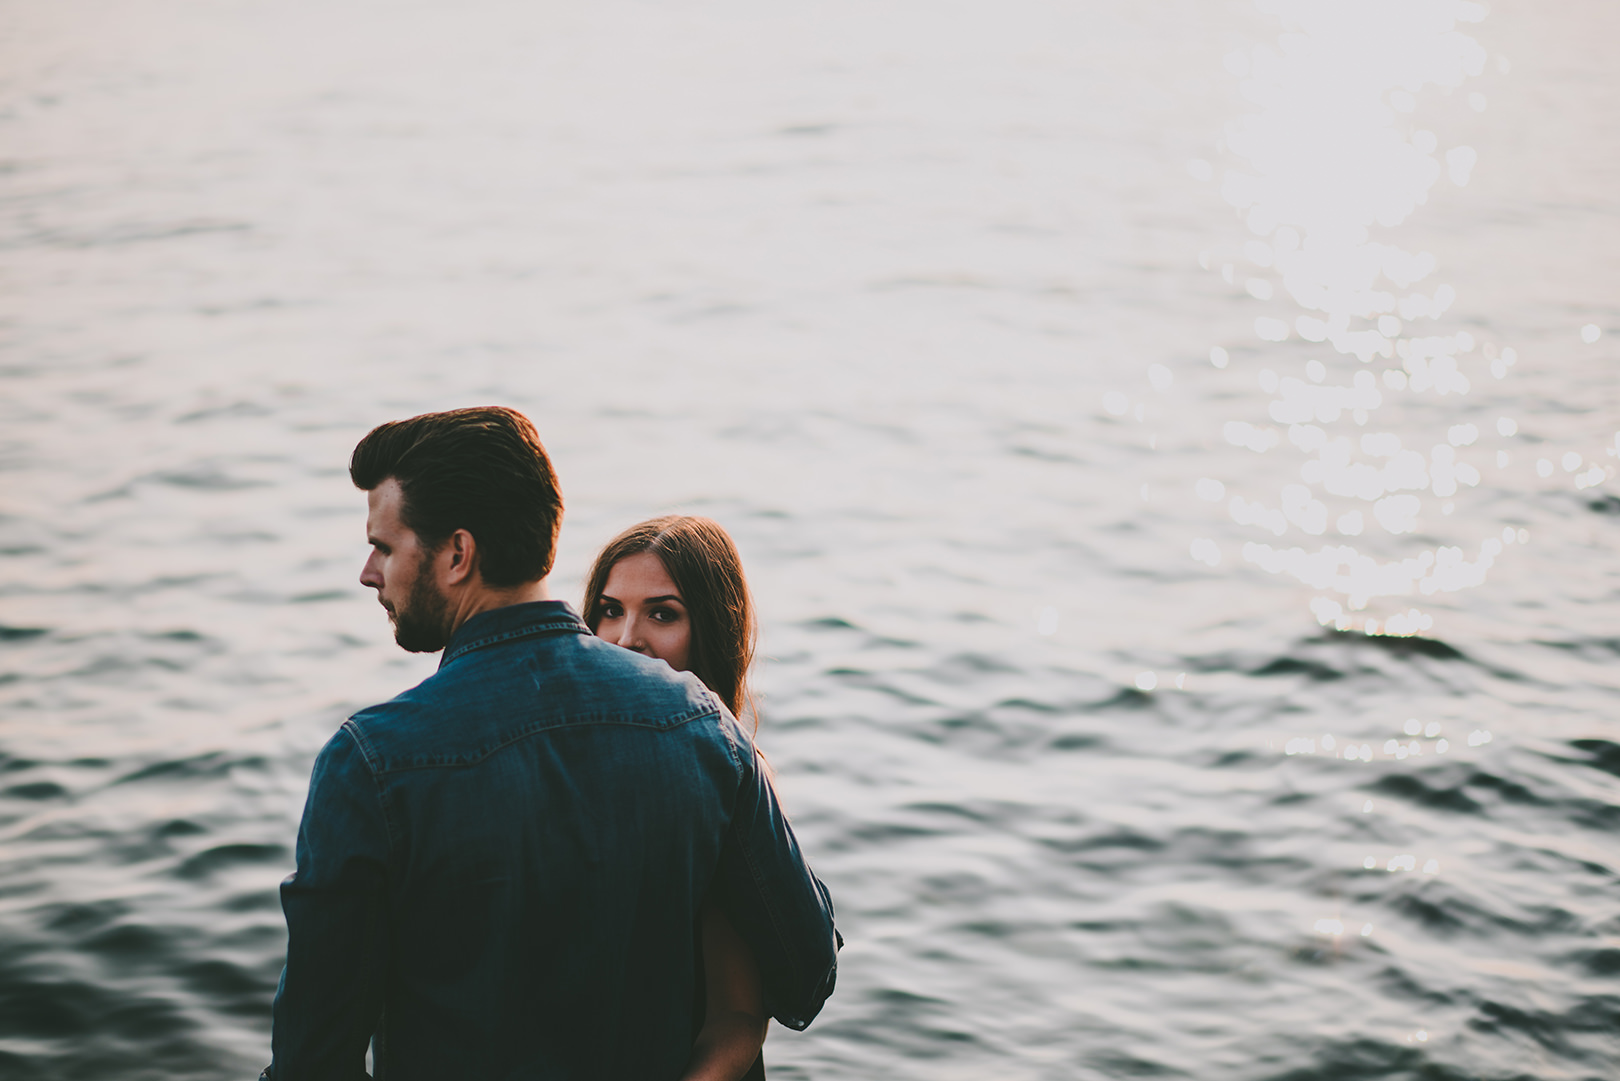 Justin & Sarah - Engagement - © Dallas Kolotylo Photography - 173